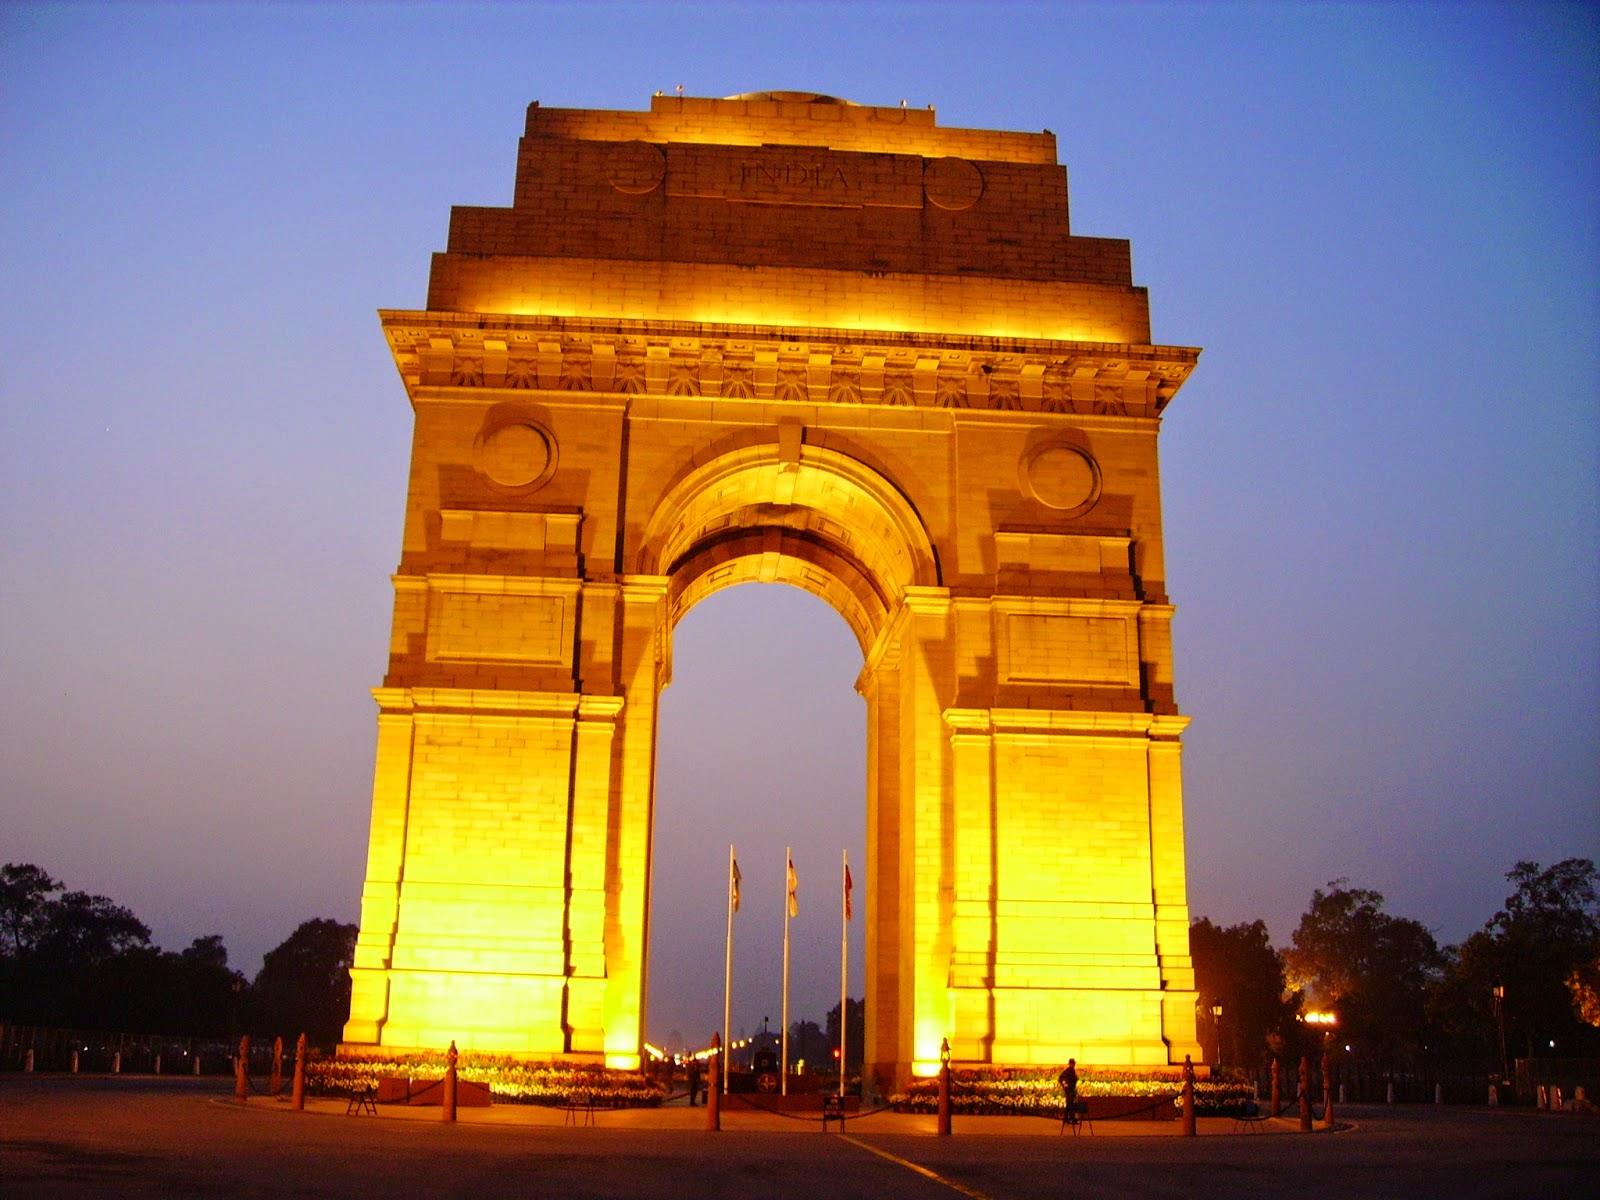 Night View of The India Gate, Delhi India